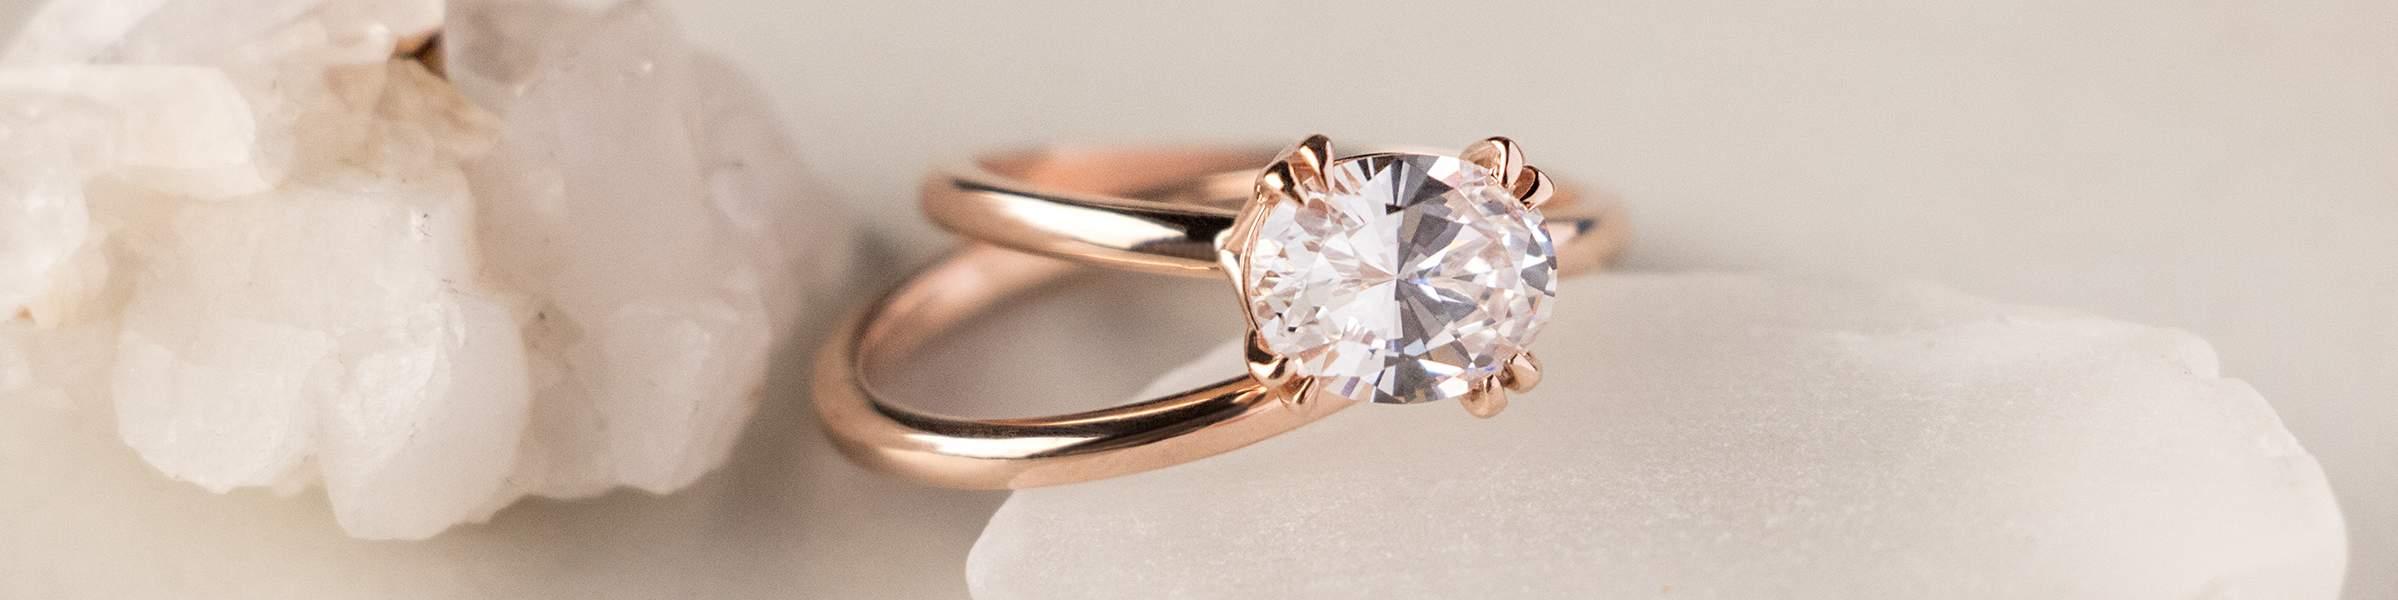 Pure Carbon Man Made Diamonds